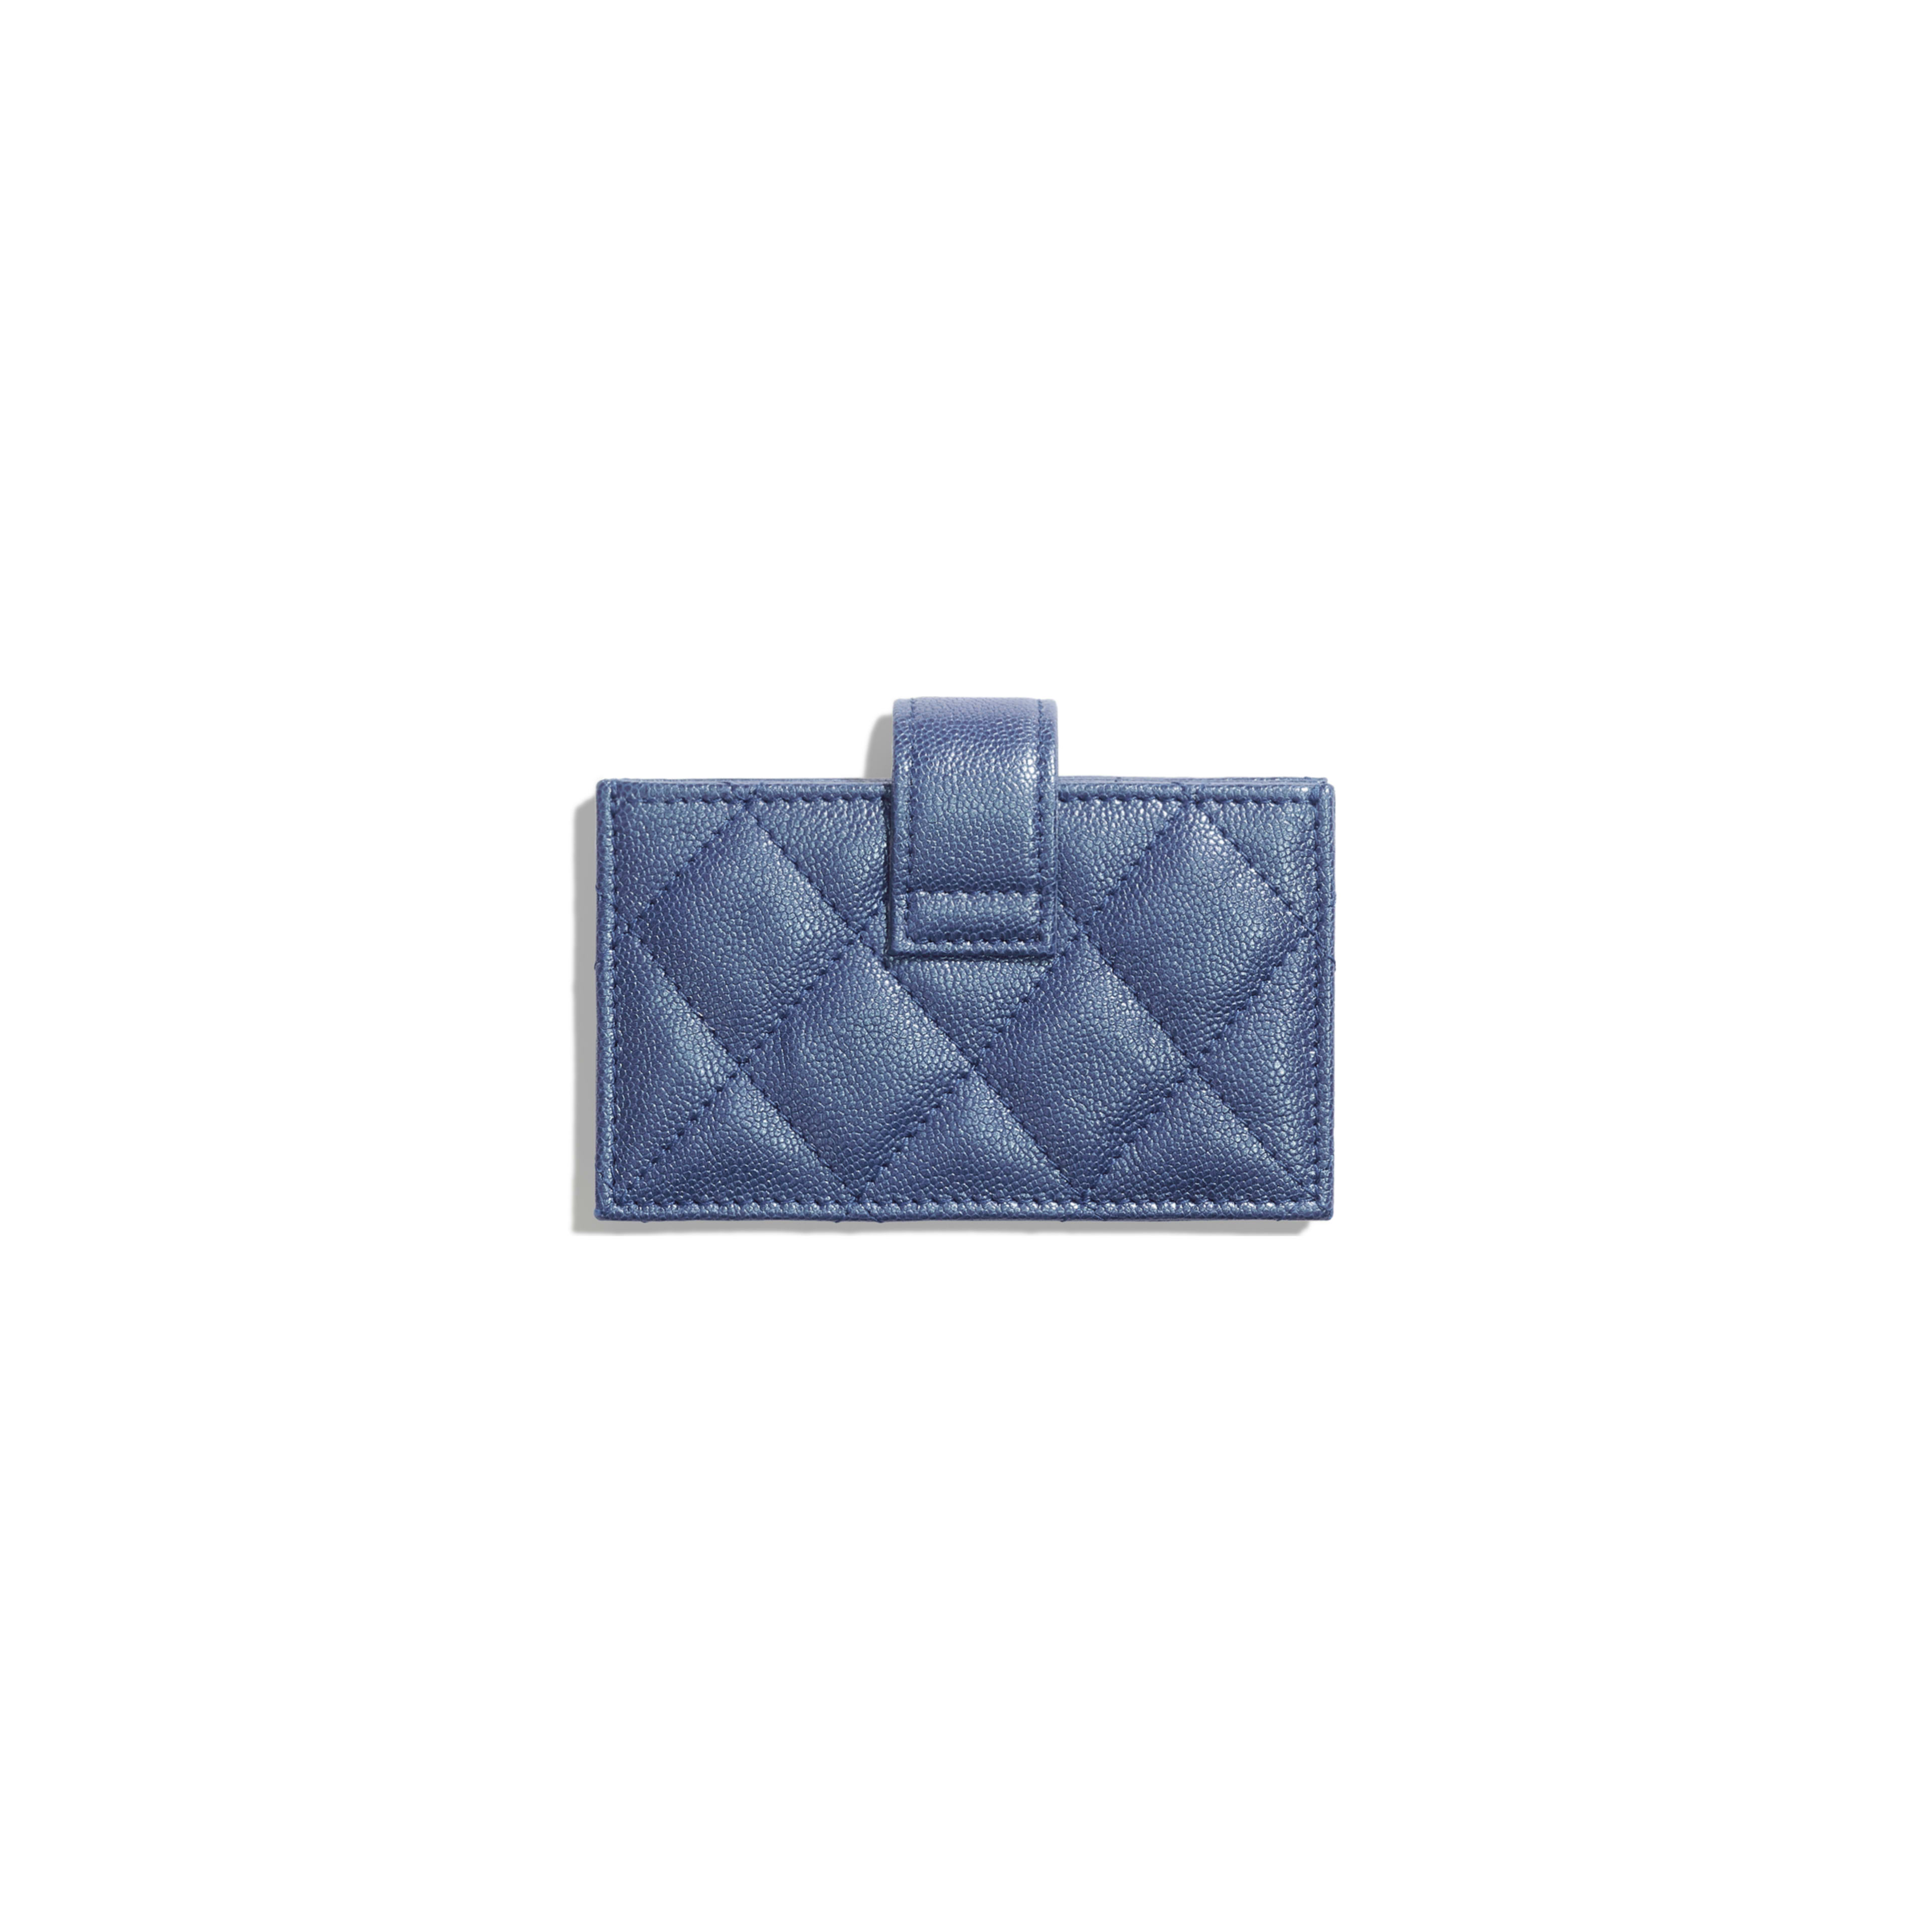 Card Holder - Dark Blue - Iridescent Grained Calfskin & Gold-Tone Metal - Alternative view - see full sized version